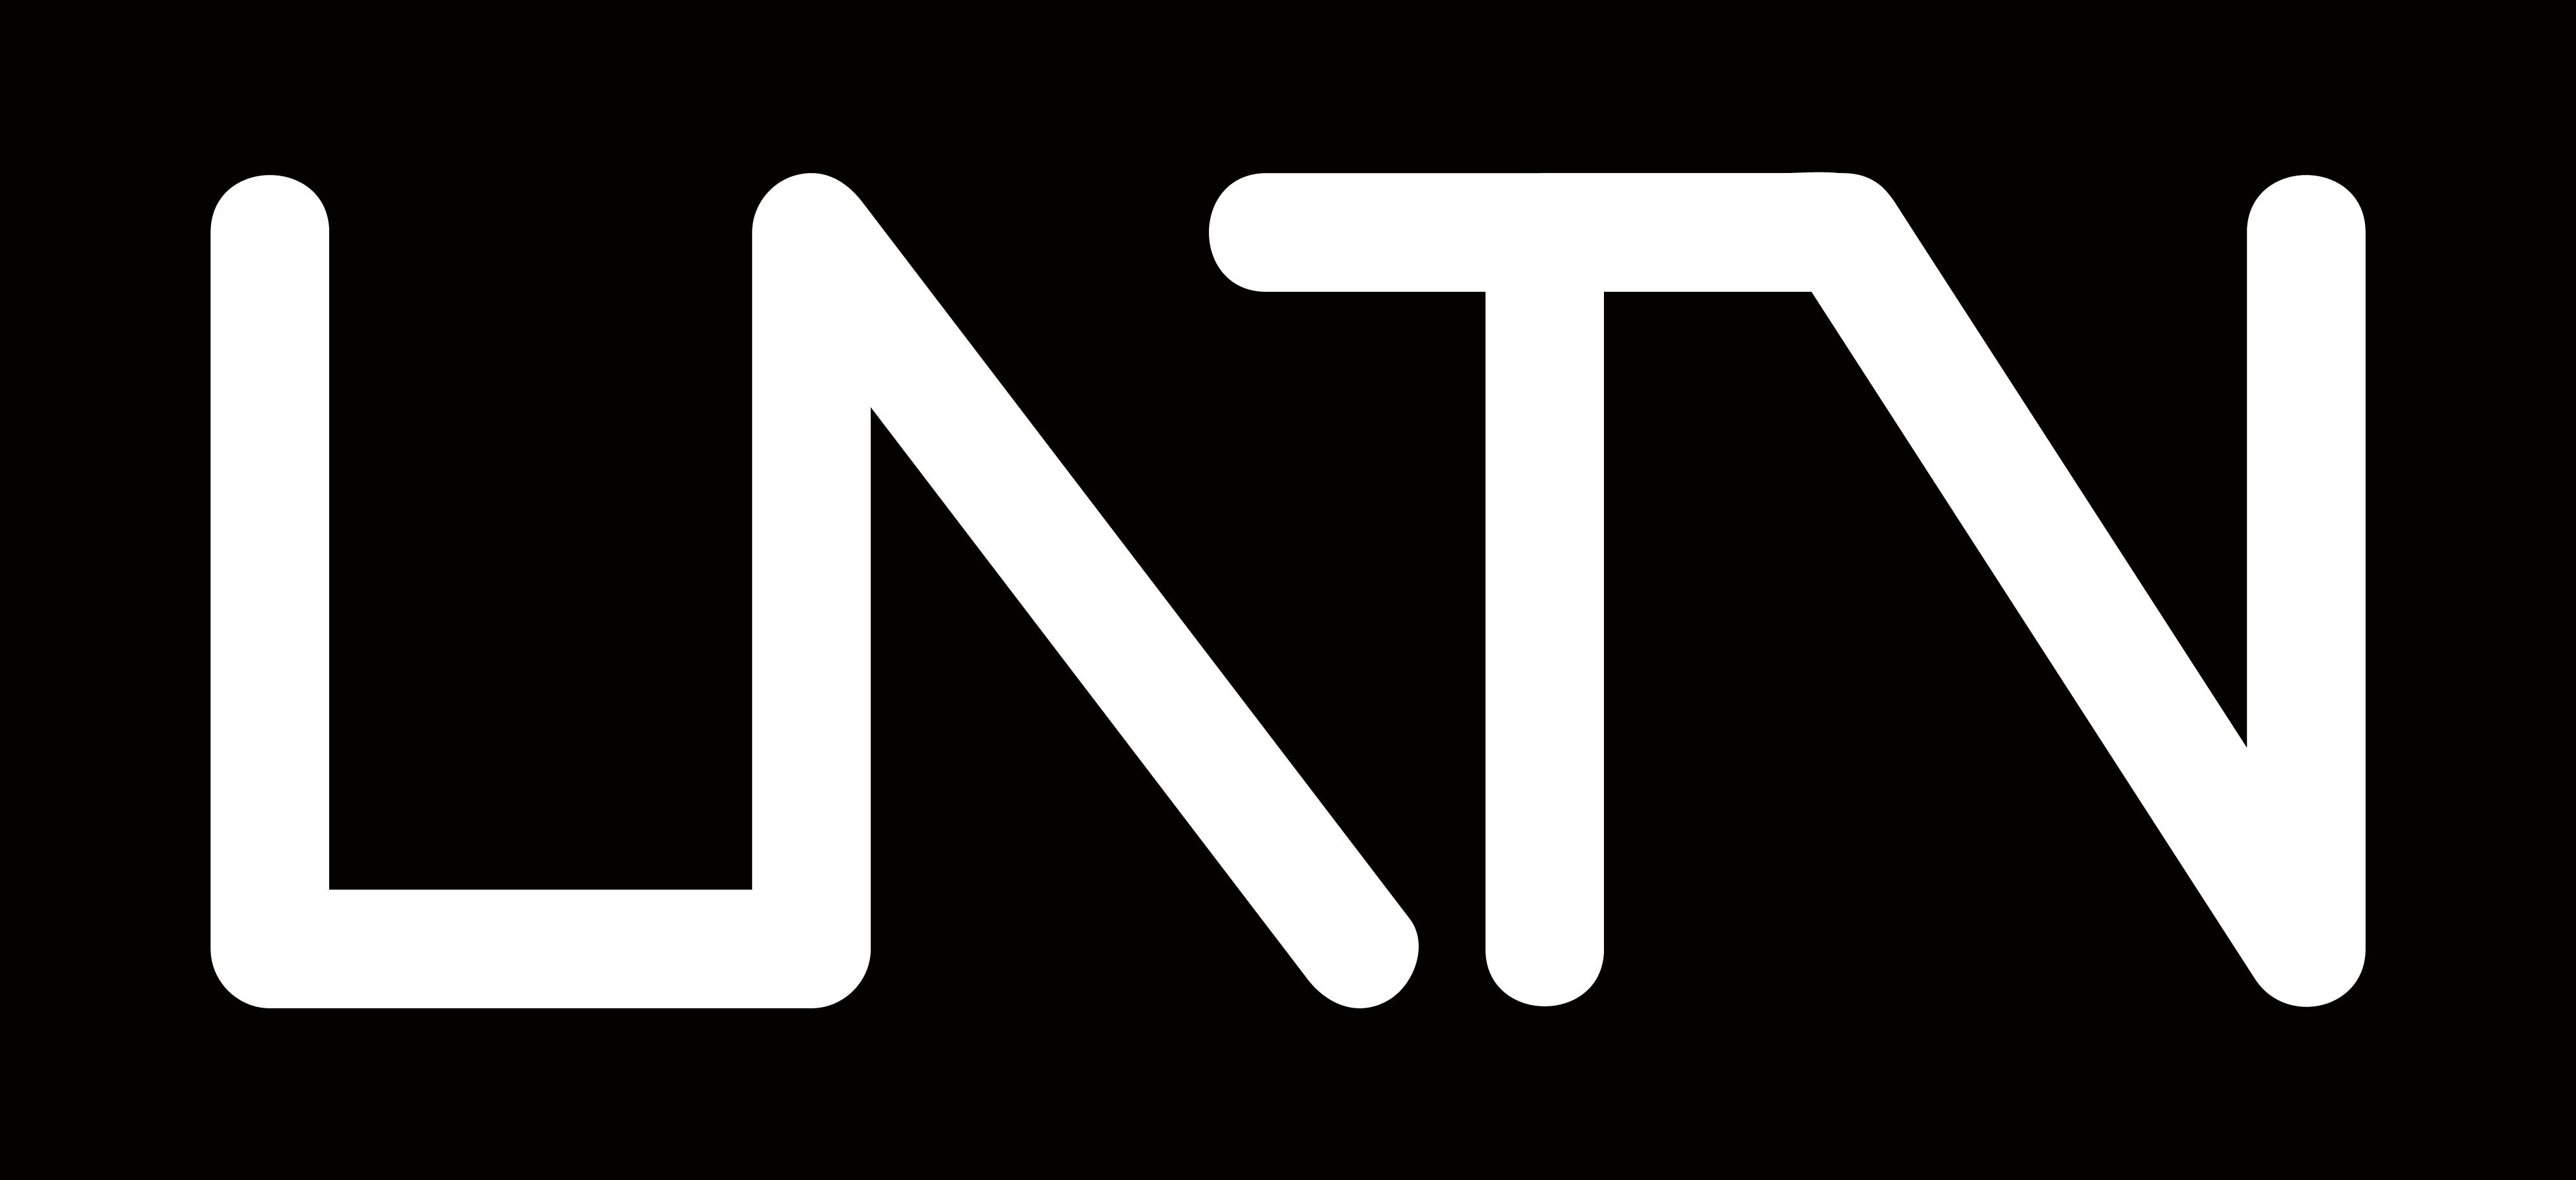 LATV Networks, LLC